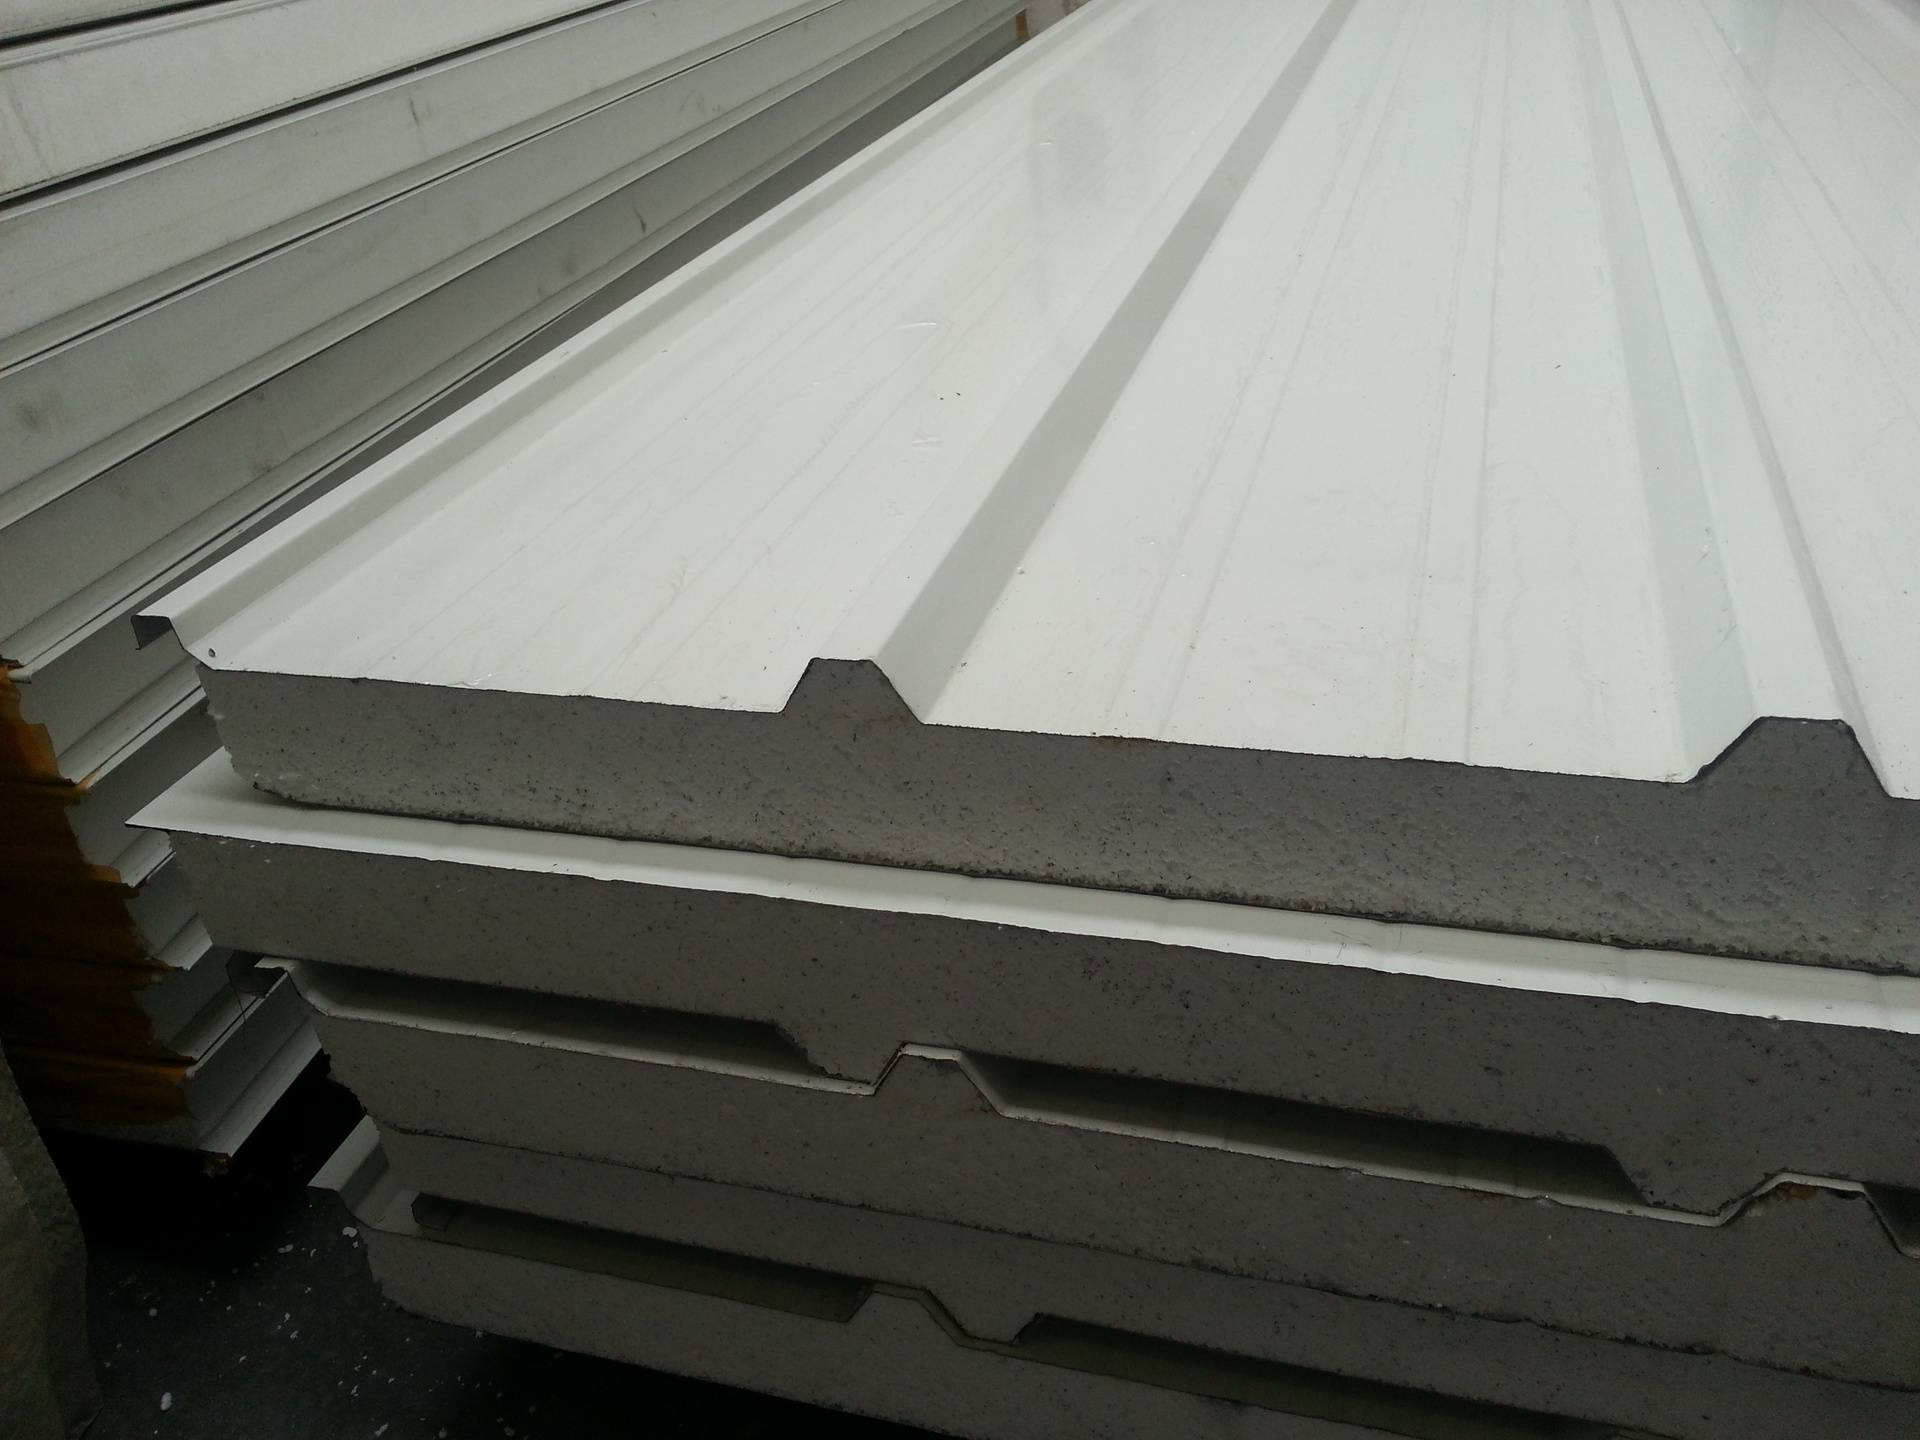 Trimdeck roof panels